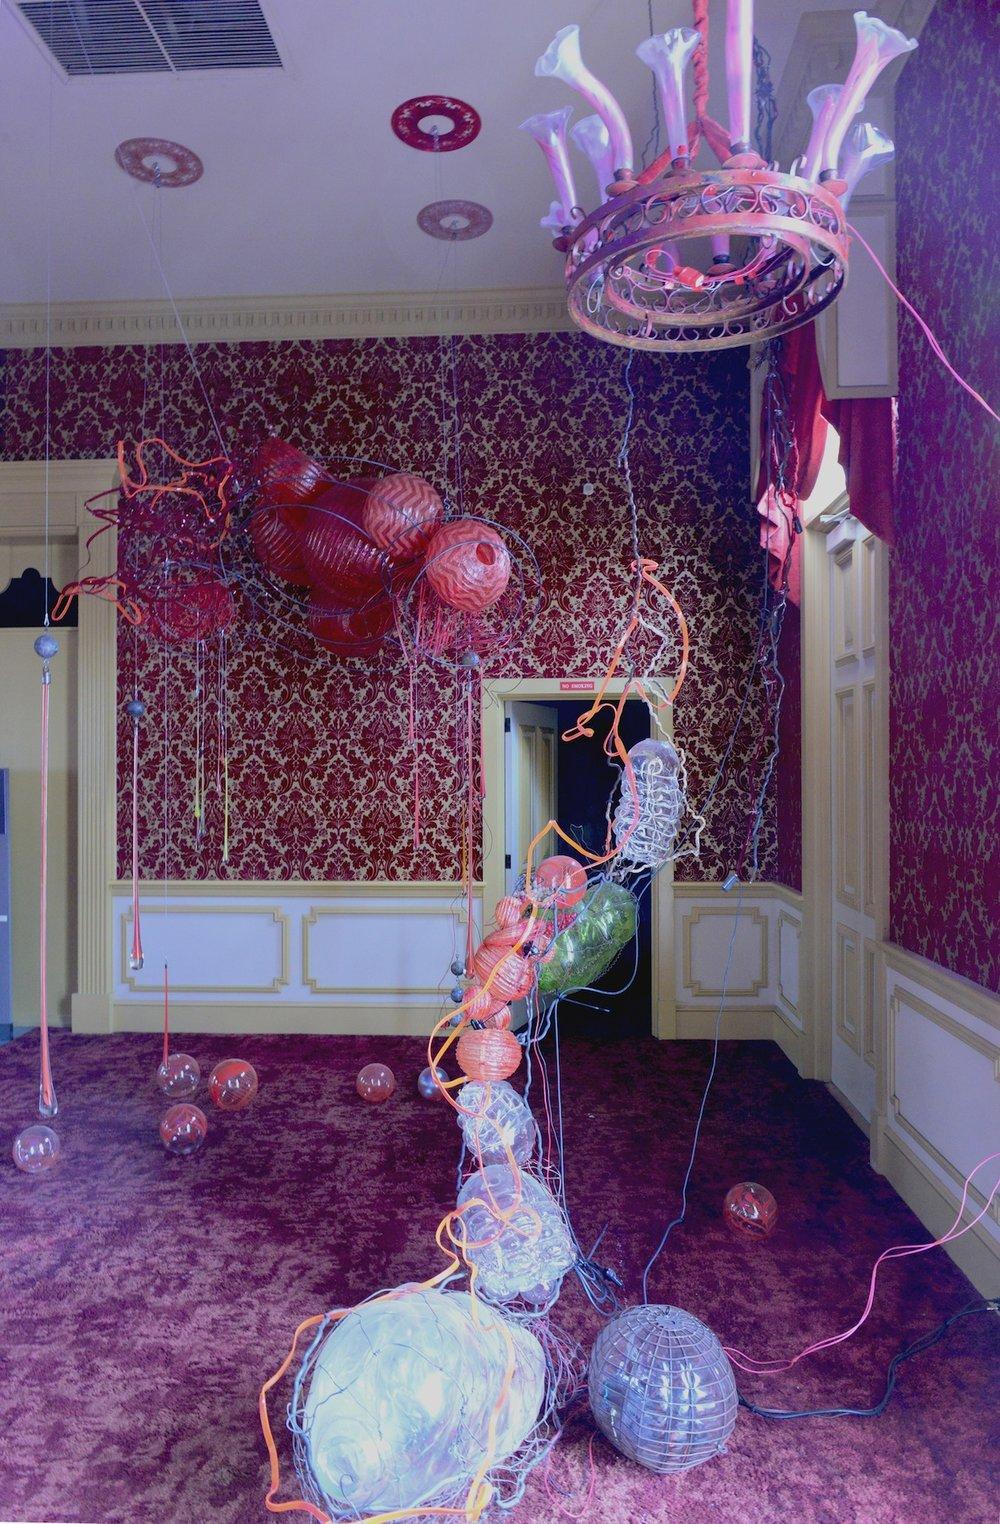 Emanation: Art + Process, 2015